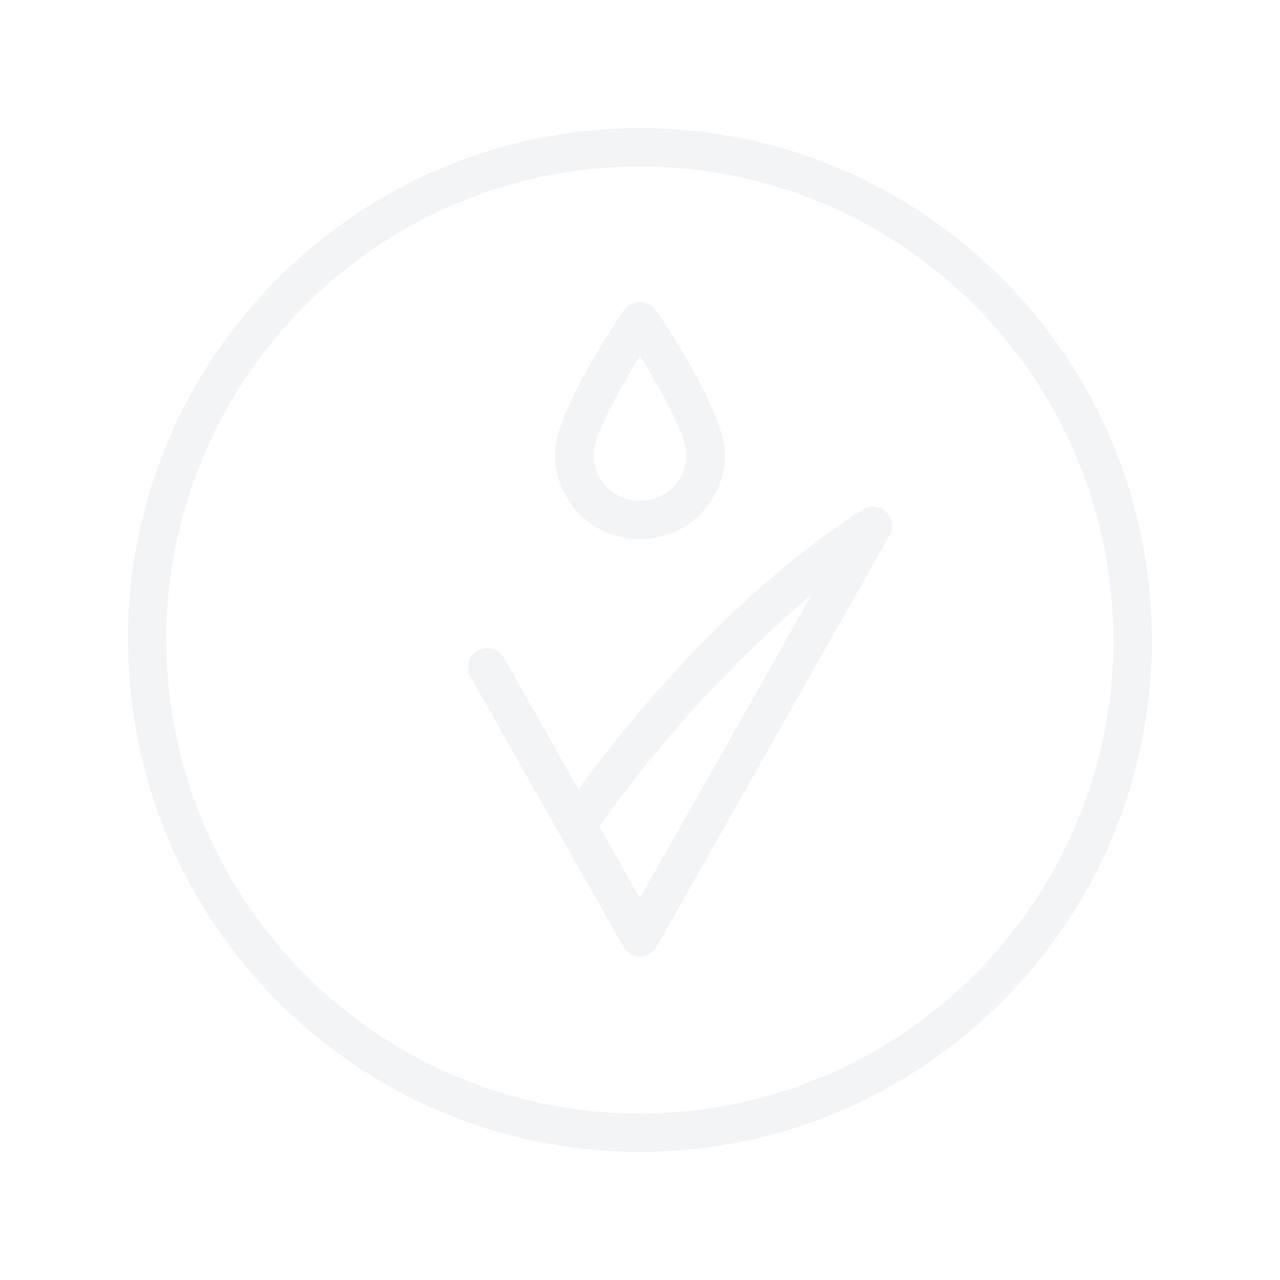 EYLURE Pro Lash Individuals Duos & Trios Eyelash Gift Set